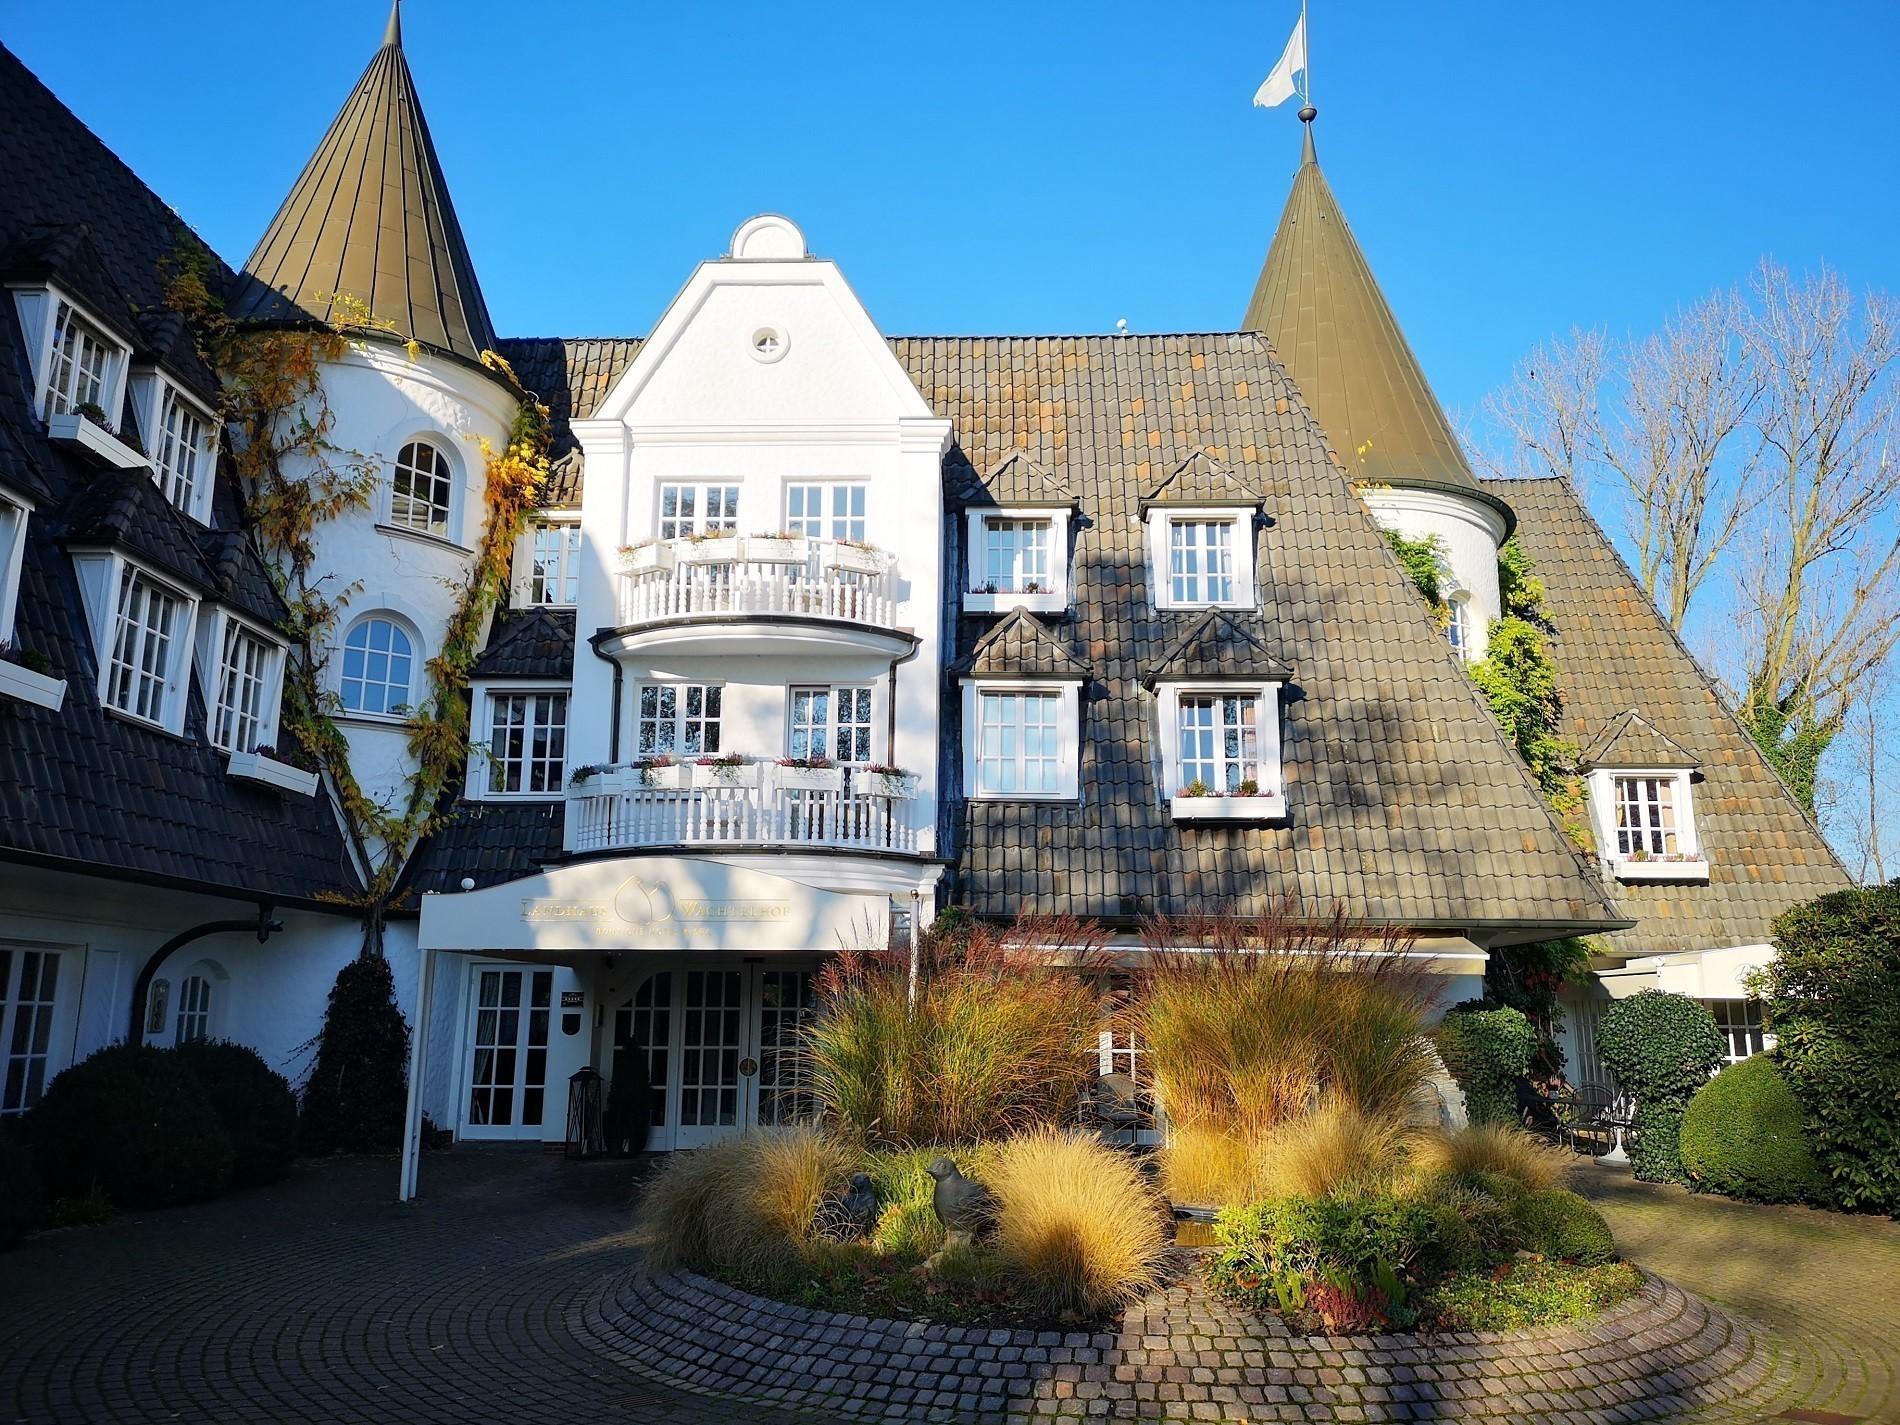 Landhaus Wachtelhof